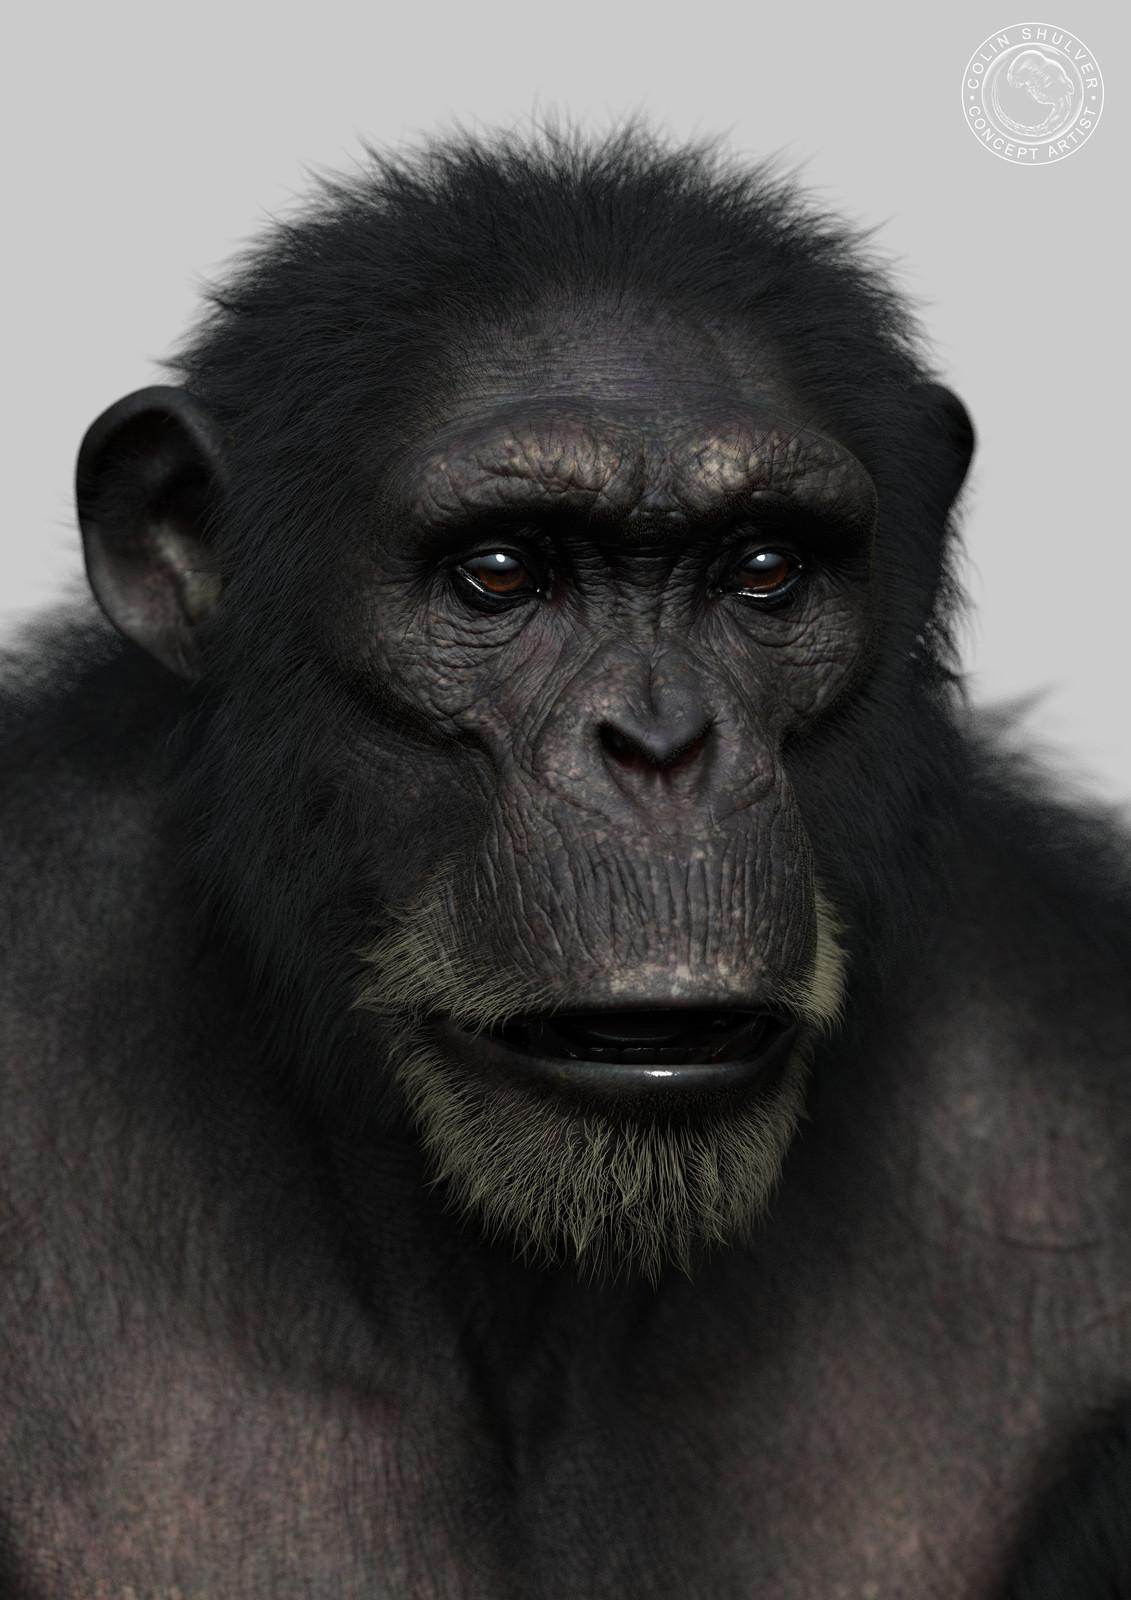 Chimpanzee - Part 2